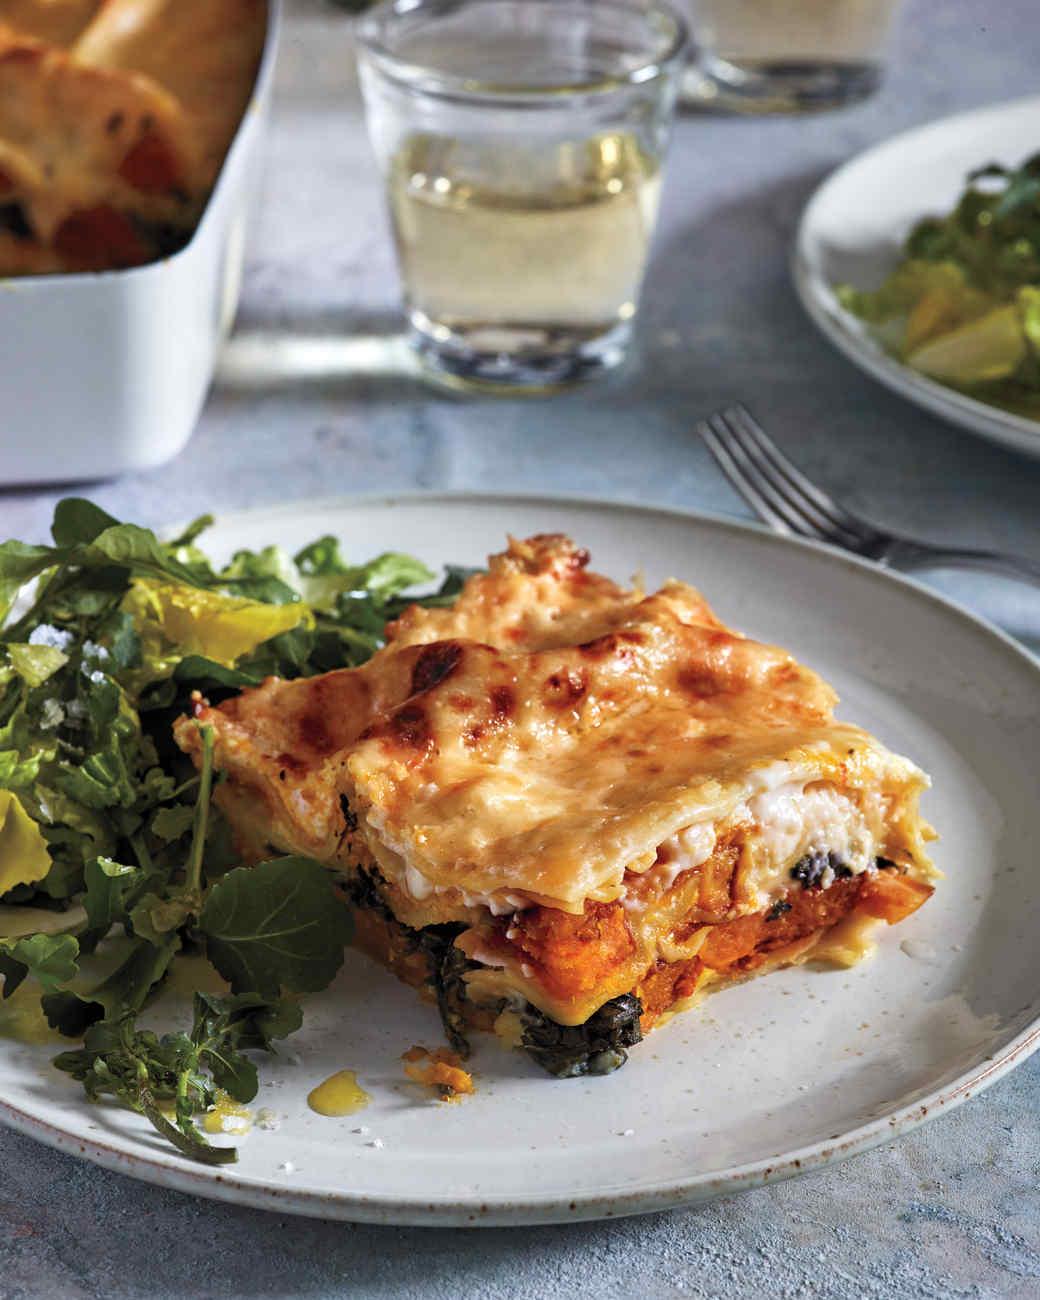 squash-lasagne-plated-112-d112223.jpg